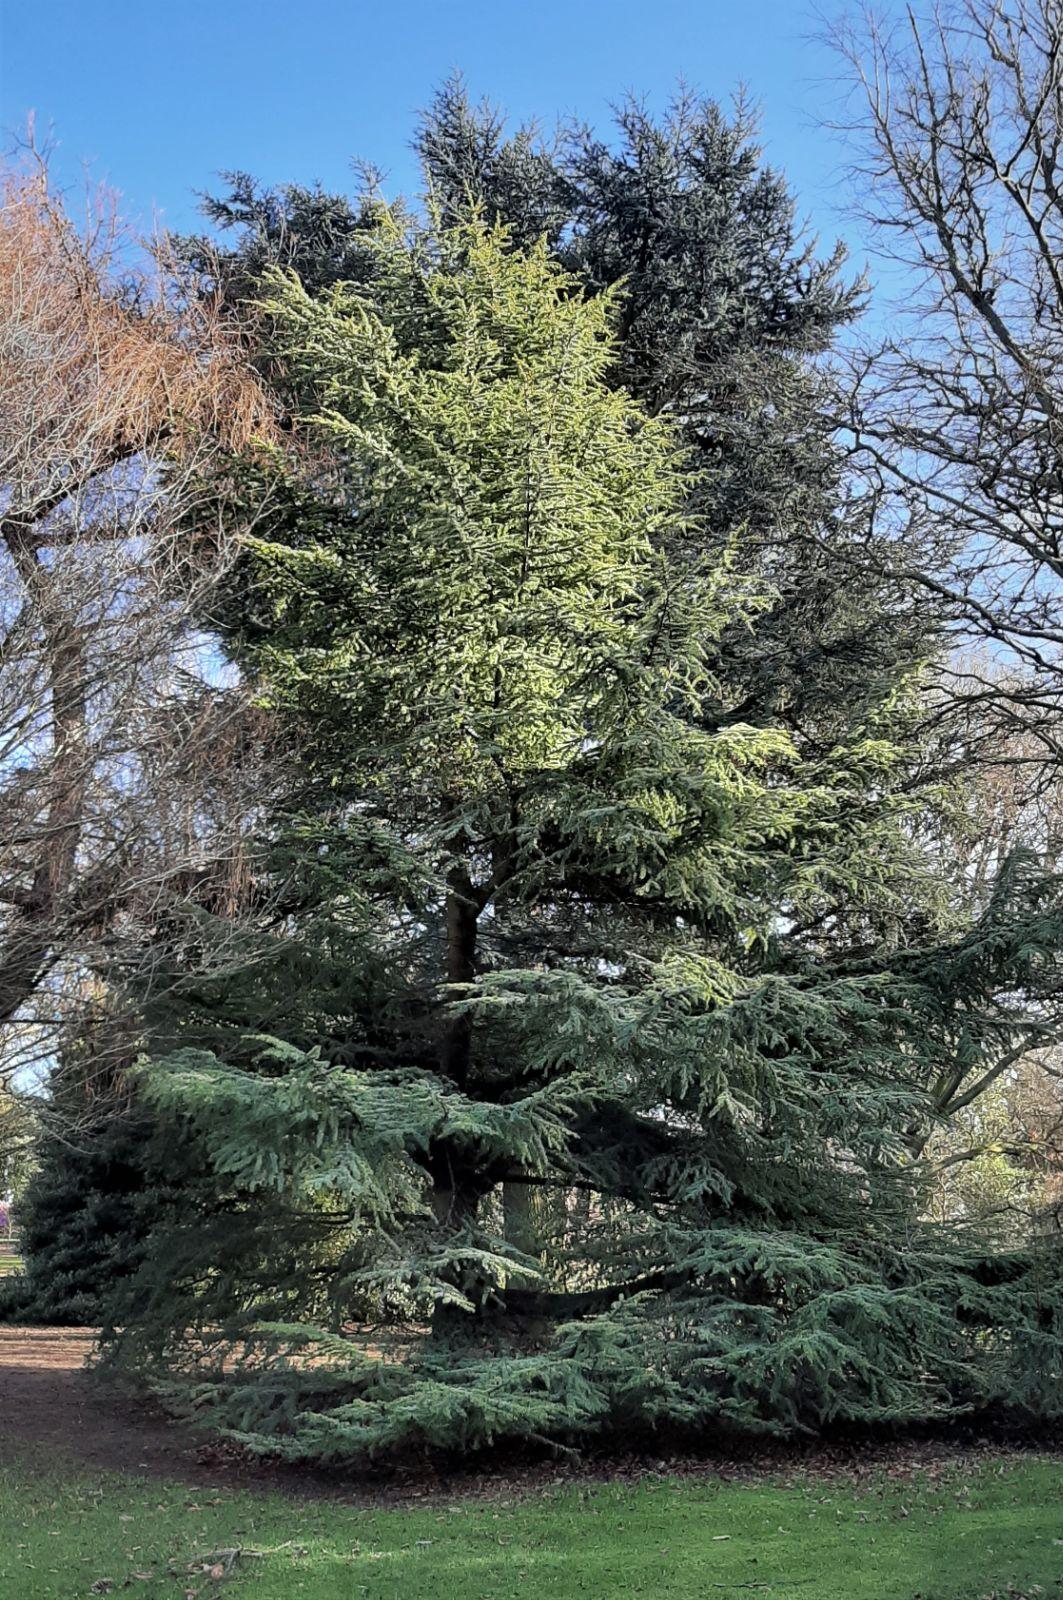 Cedrus Atlantica Alveolus 1 Plant 1 Plant Cedar Dell/'Attlante Coniferous Tree